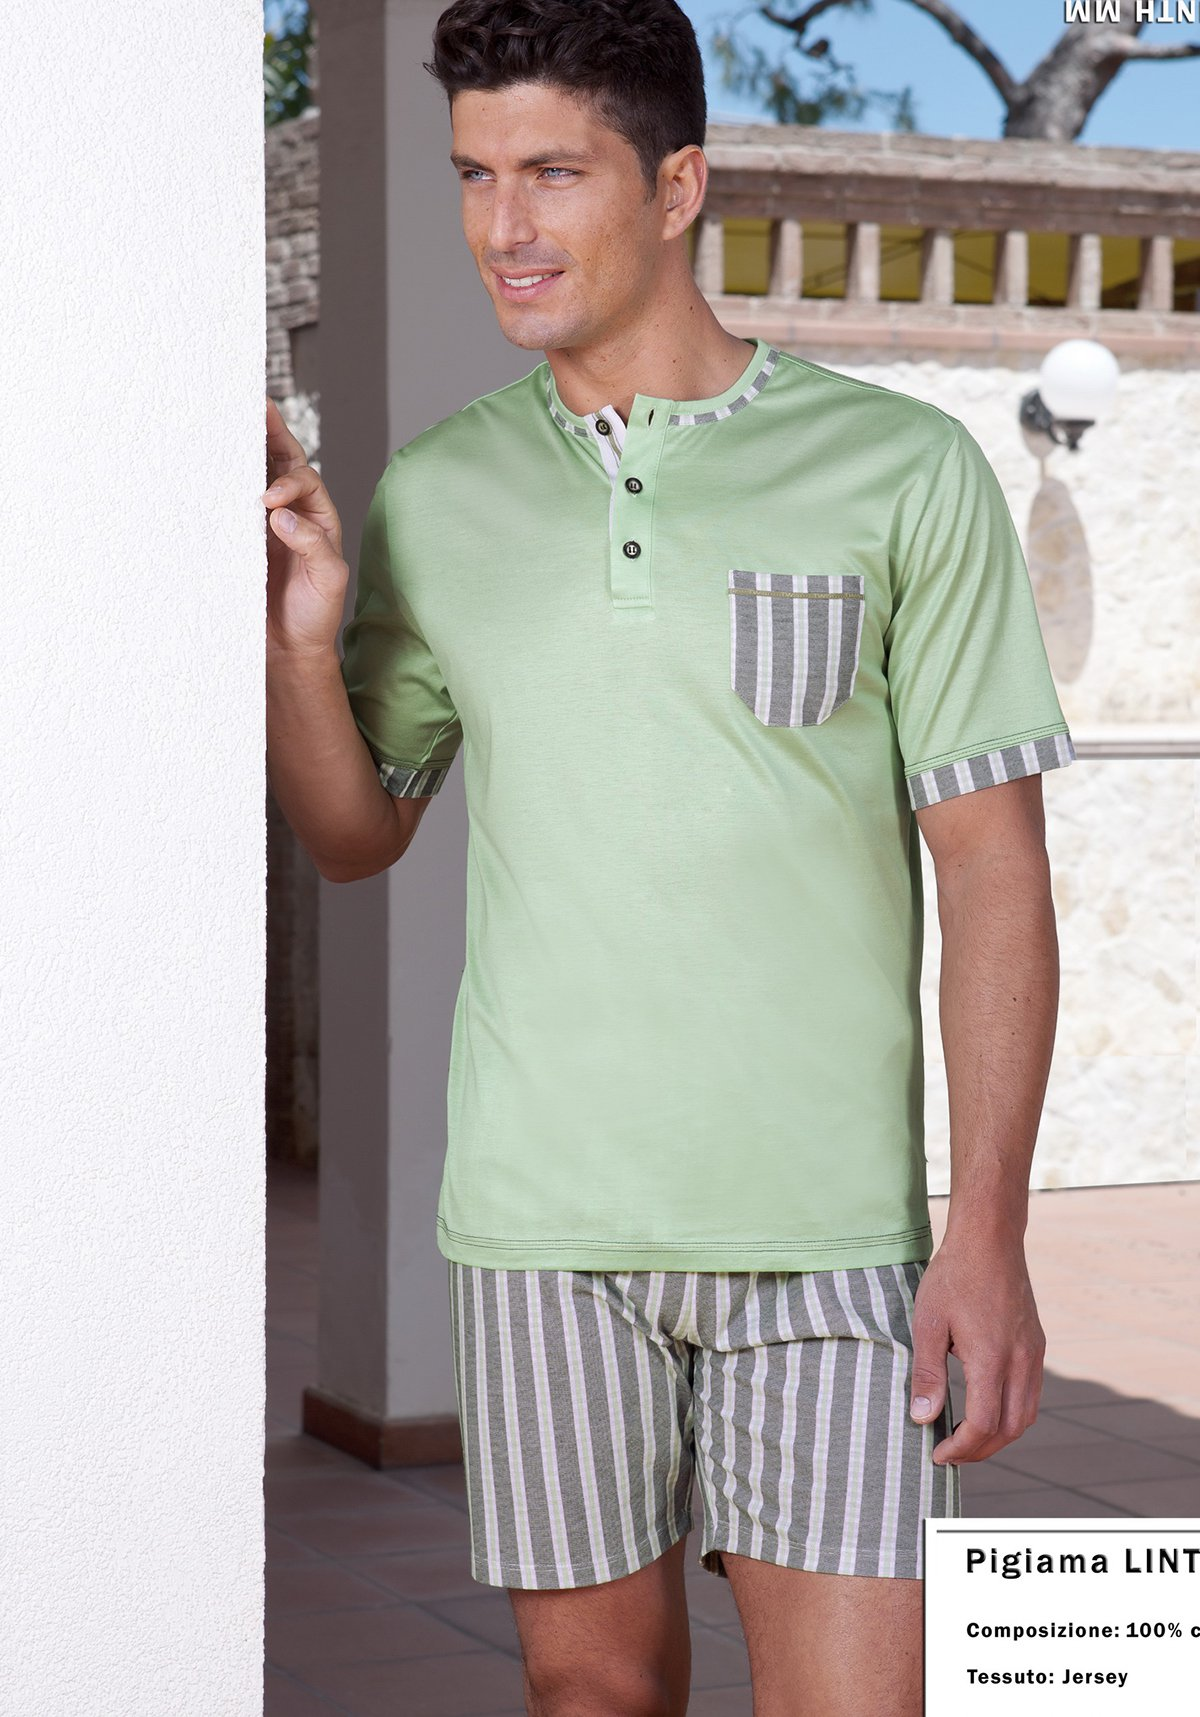 Пижама Maeveen Цвет: Зеленый (50) Twisi twi507354